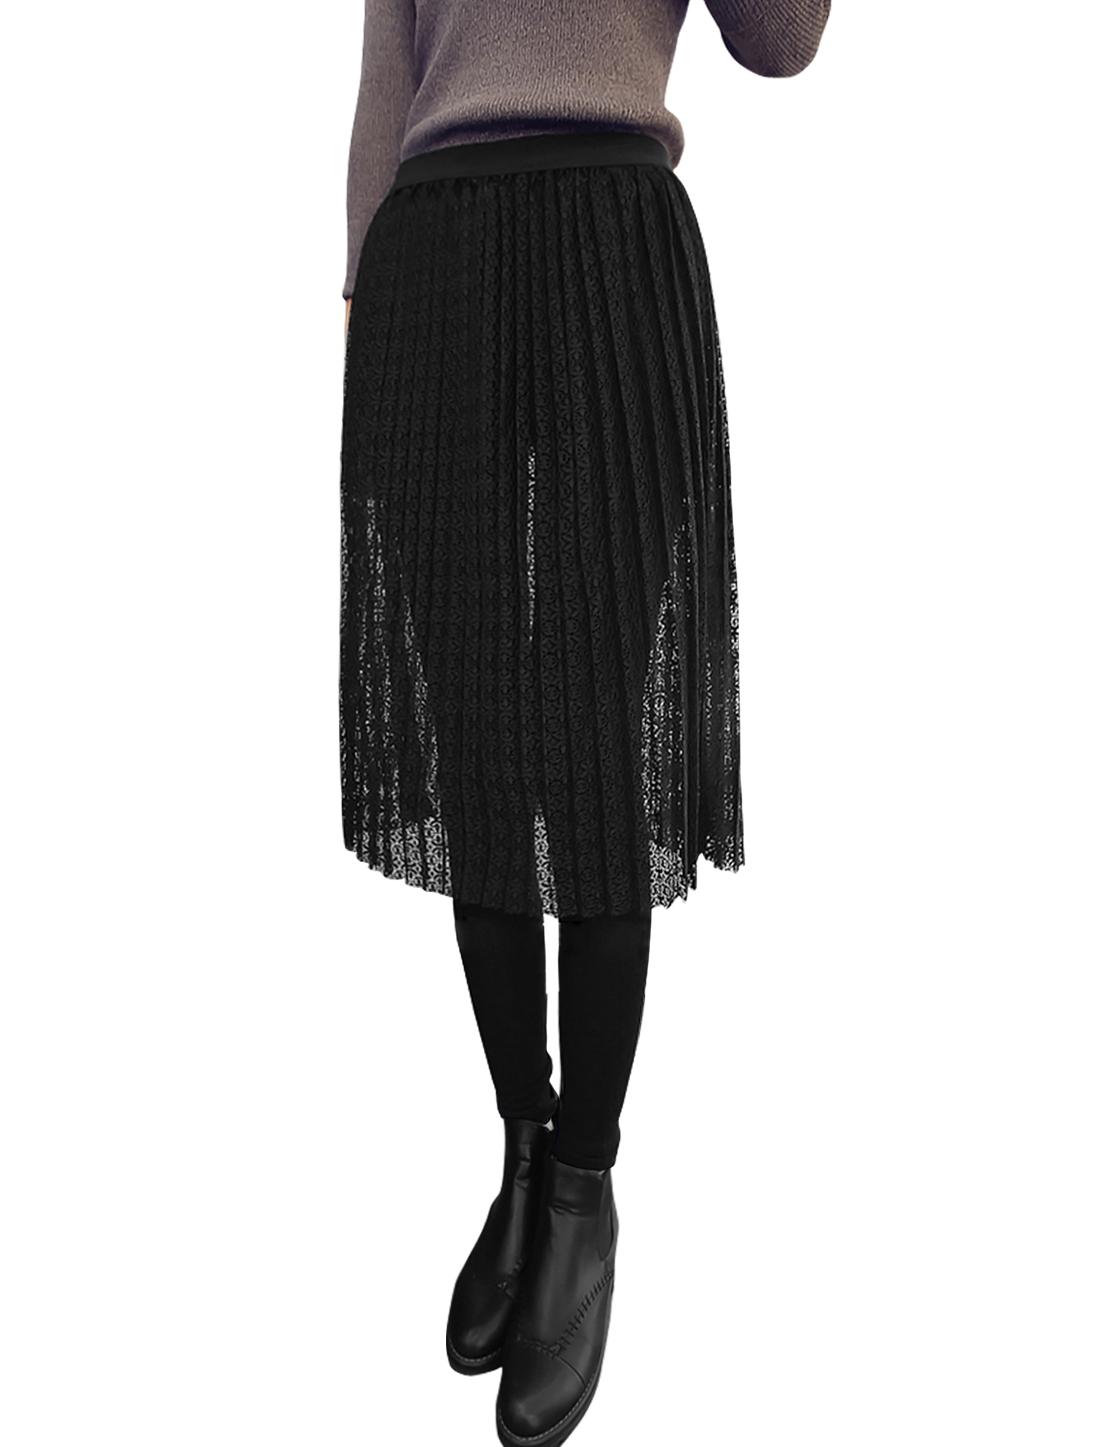 Lady Elastic Waist Lace Panel Pleated Design Skirt Leggings Black XS